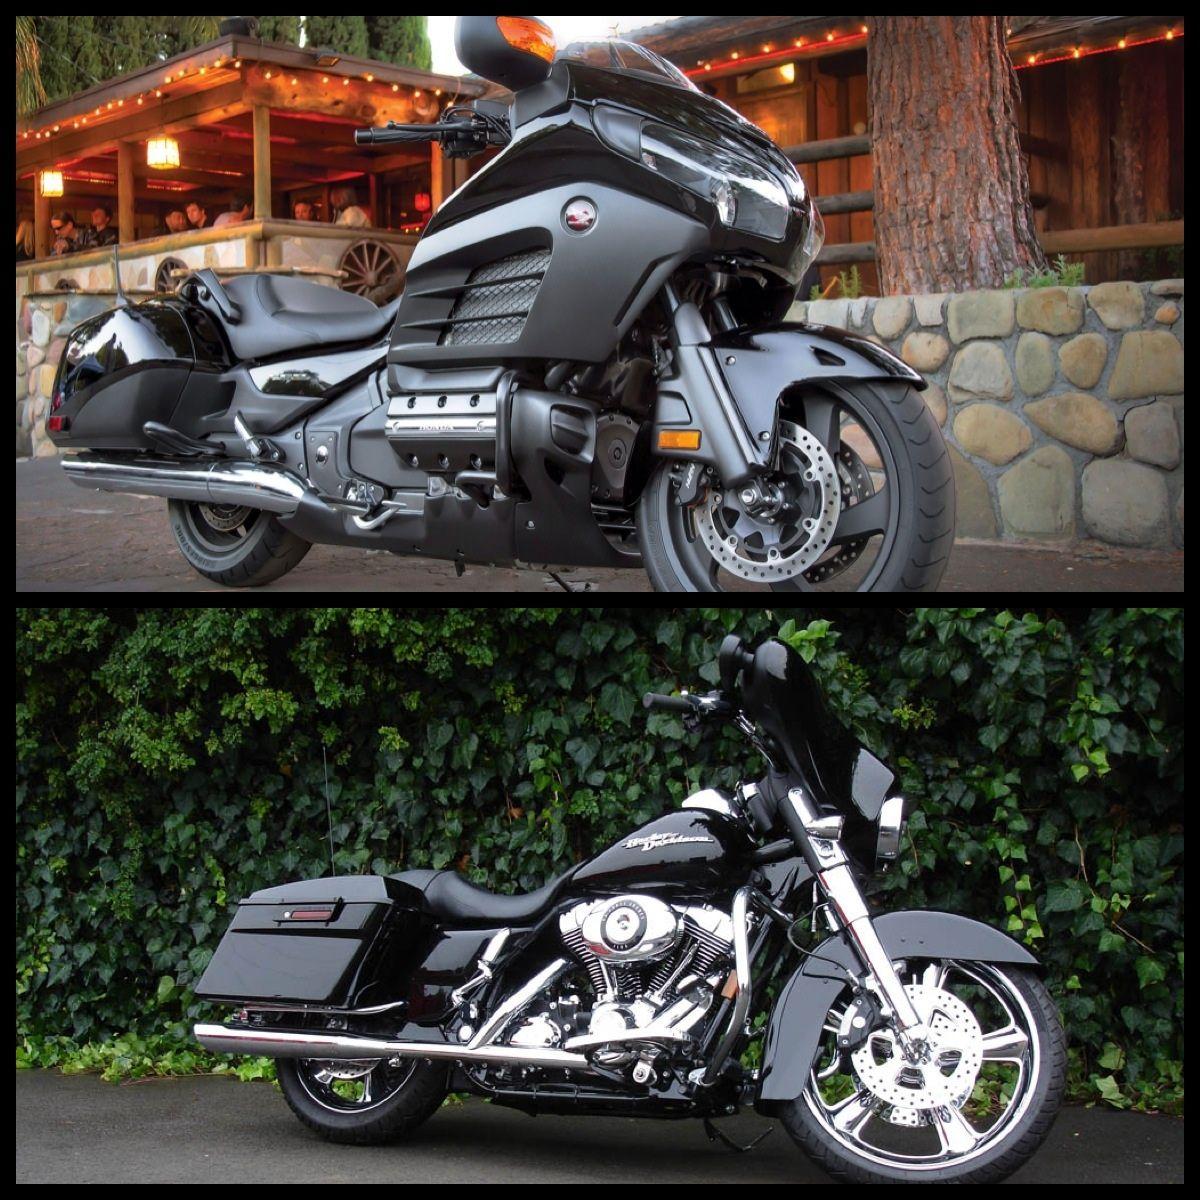 Honda F6b Comparison With Harley Davidson Bagger